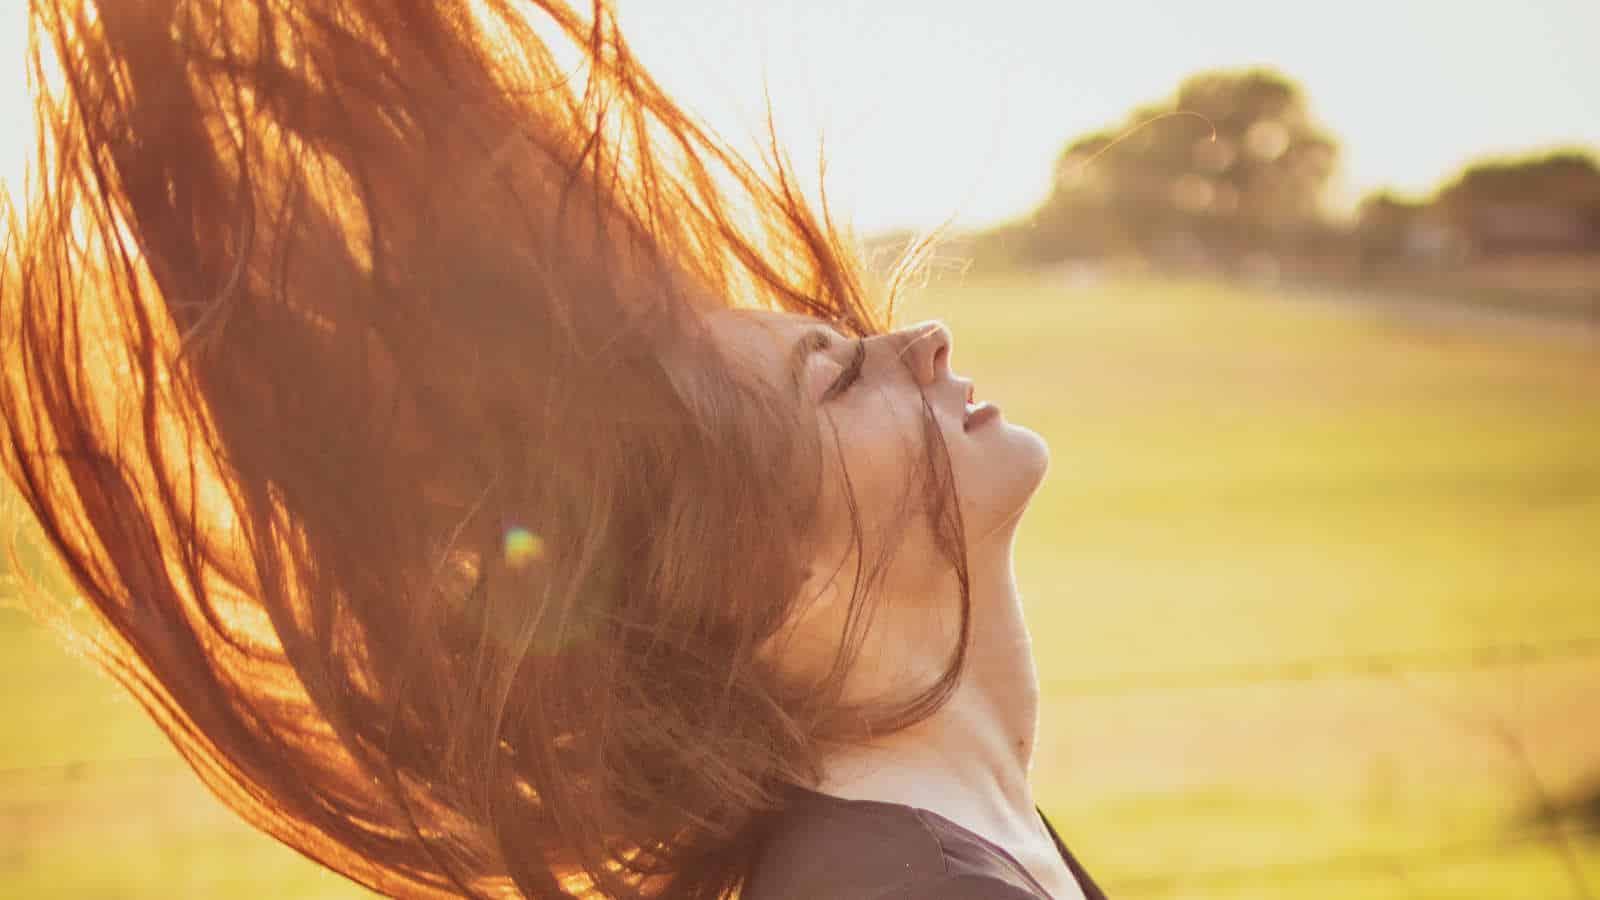 Haaröl selber machen- Die 5 besten DIY-Haaröl Rezepte & Anleitungen